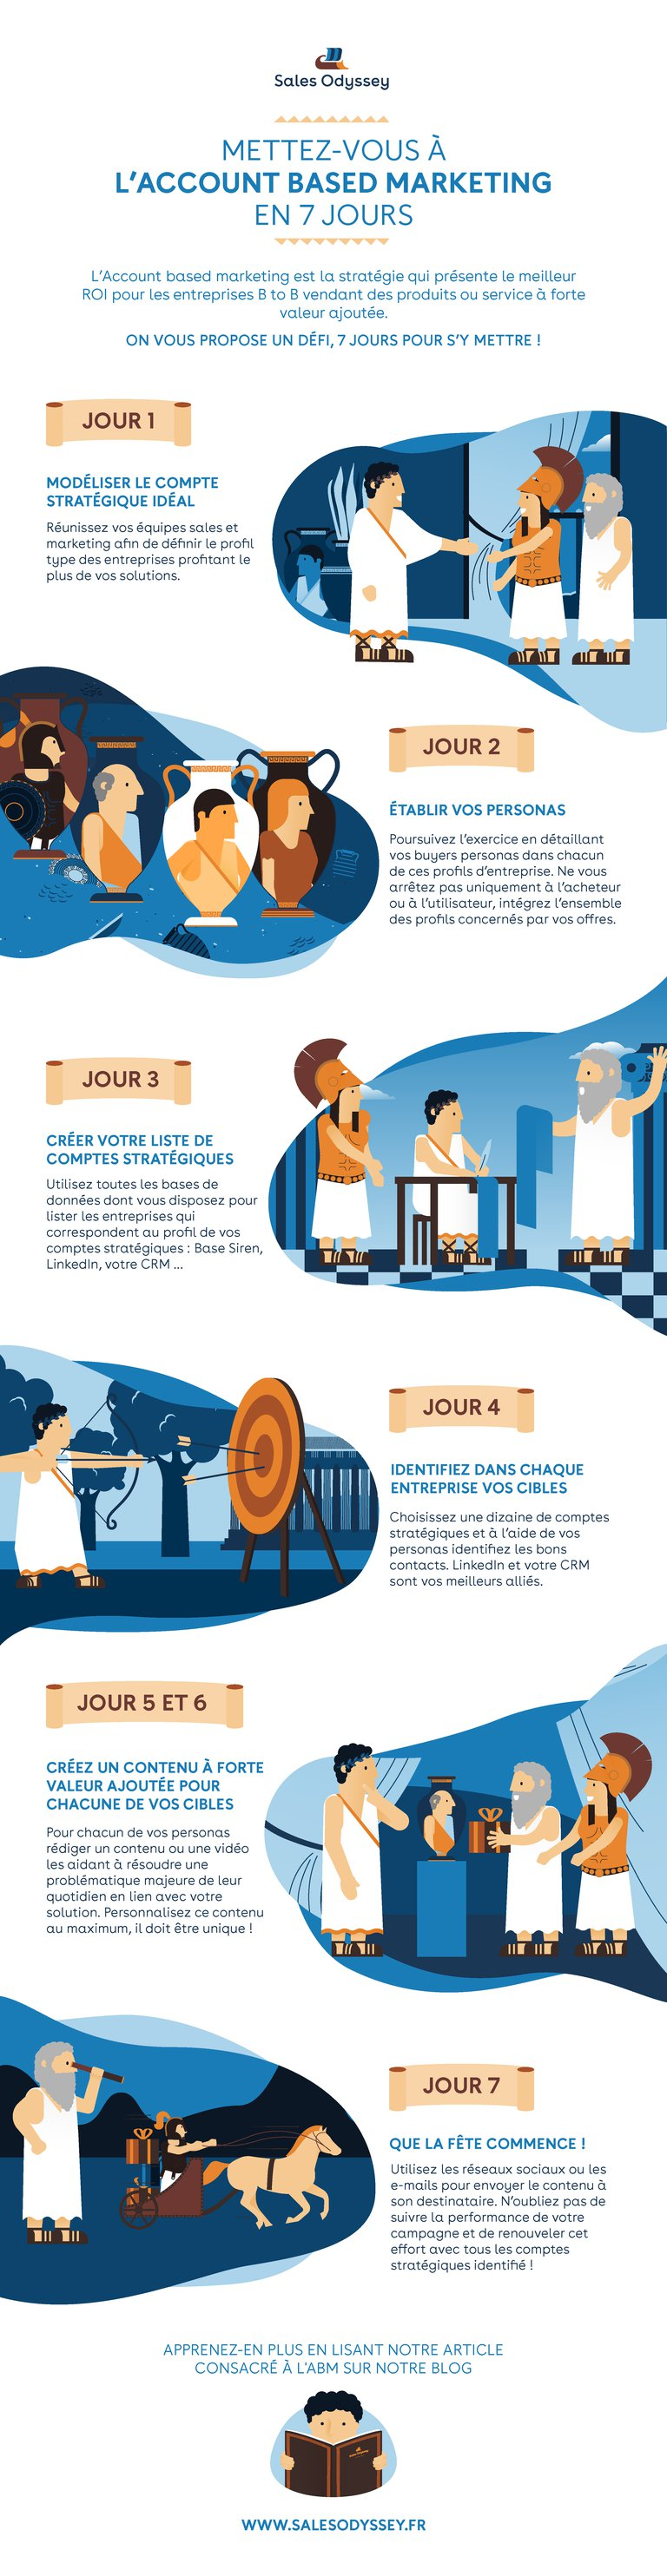 Infographie mettre en place l'Account based marketing